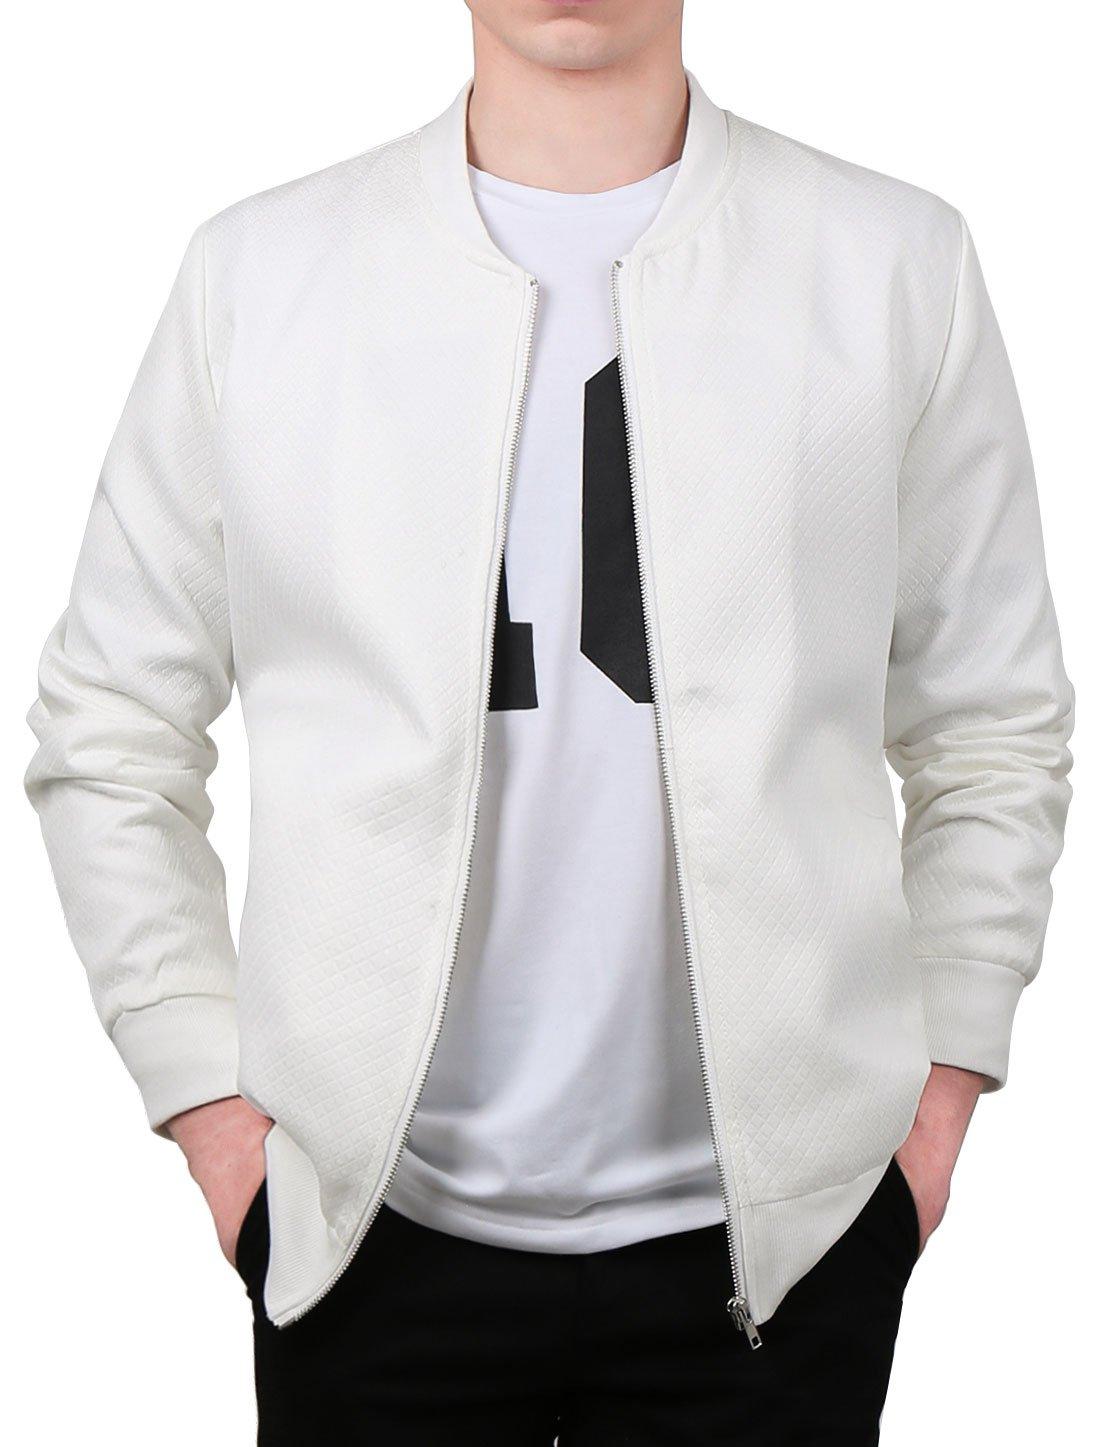 Allegra K Men Long Sleeve Stand Collar Zipper Slant Pockets Slim Fit Jacket S White